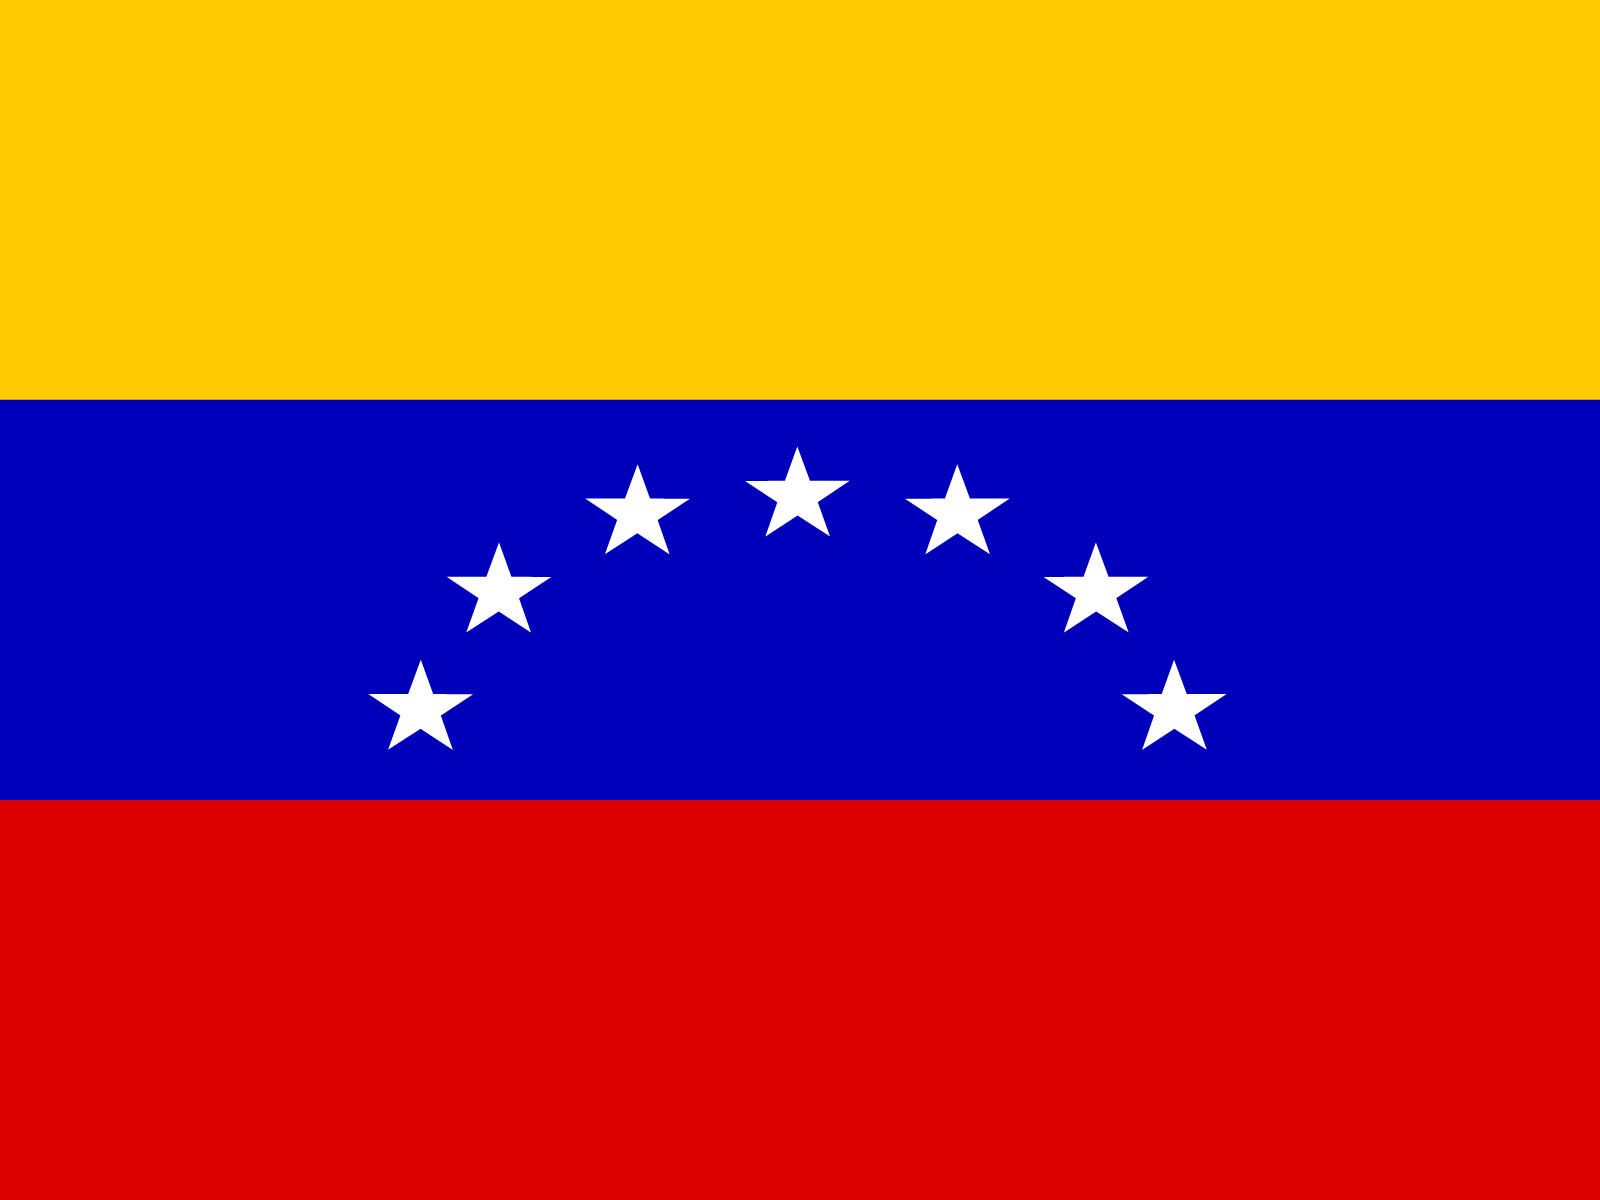 venezuela flag backgrounds flag templates free ppt religious christmas clipart free downloads religious christmas clipart free downloads